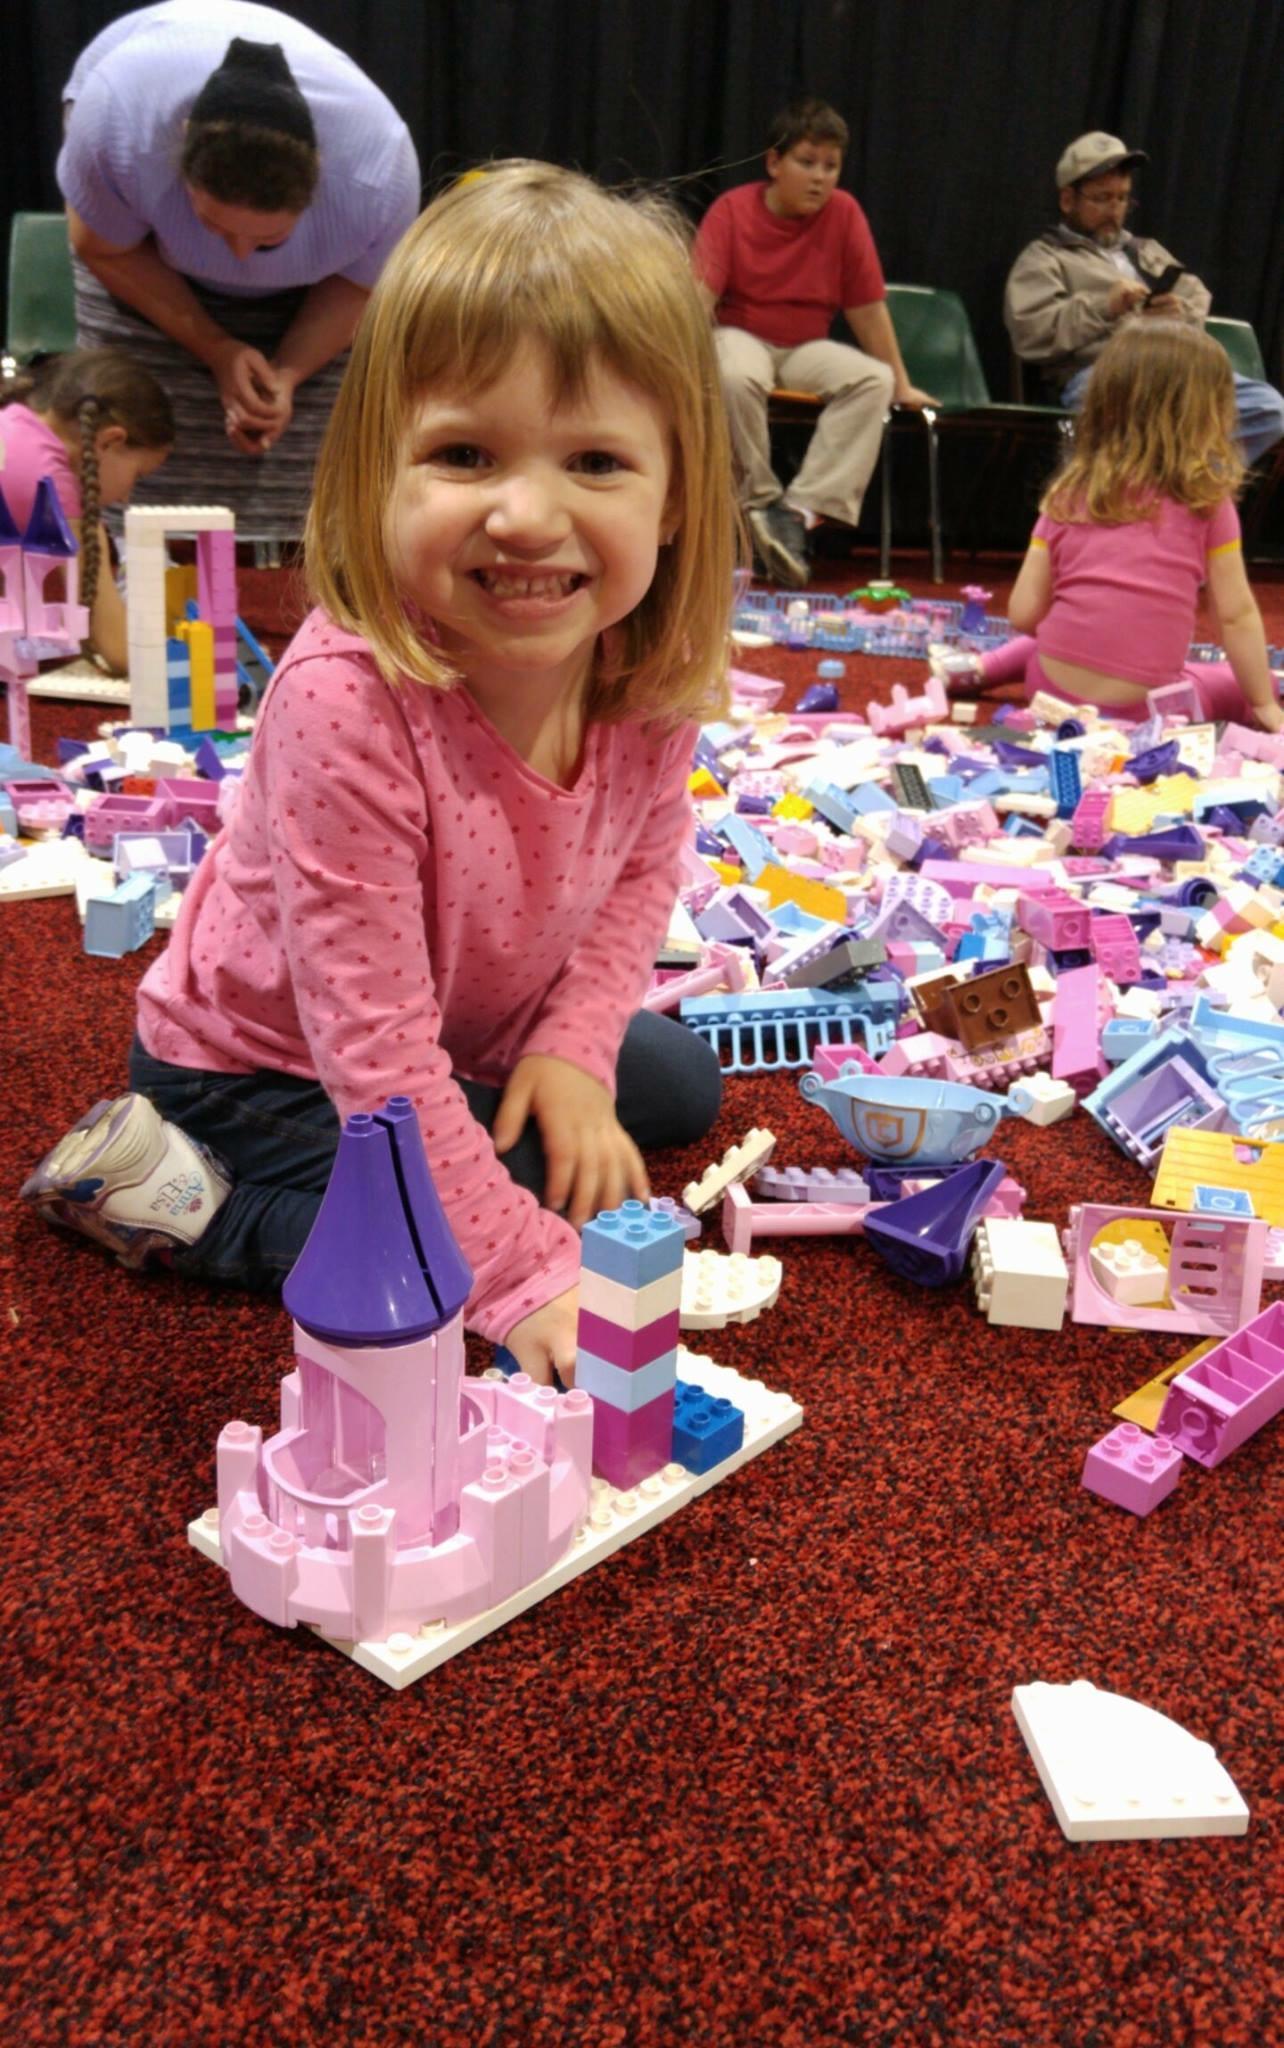 LEGO KidsFest @ohbotherblog